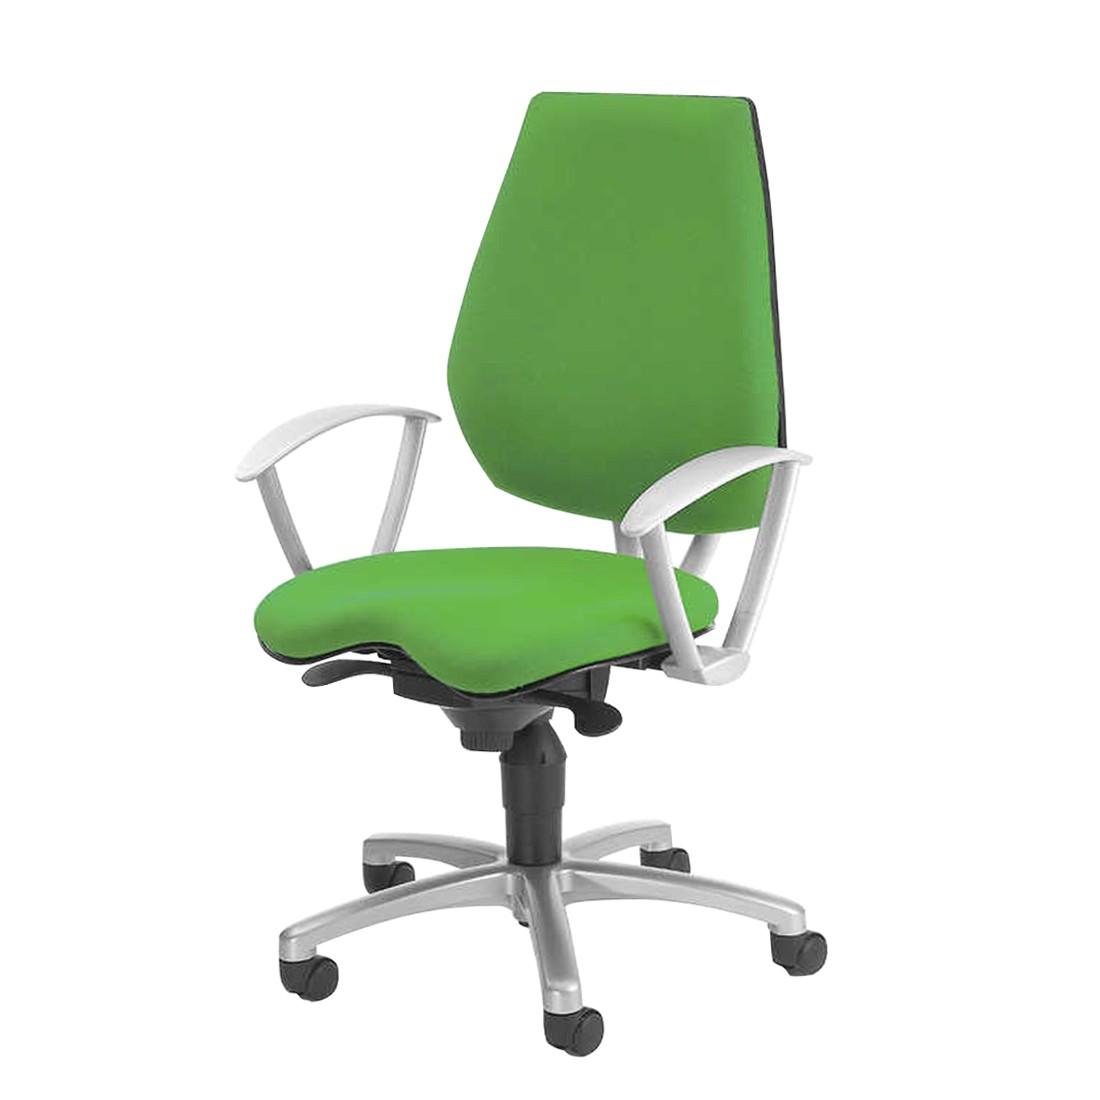 Drehstuhl Alustar – Textilbezug – apfelgrün, Topstar jetzt bestellen